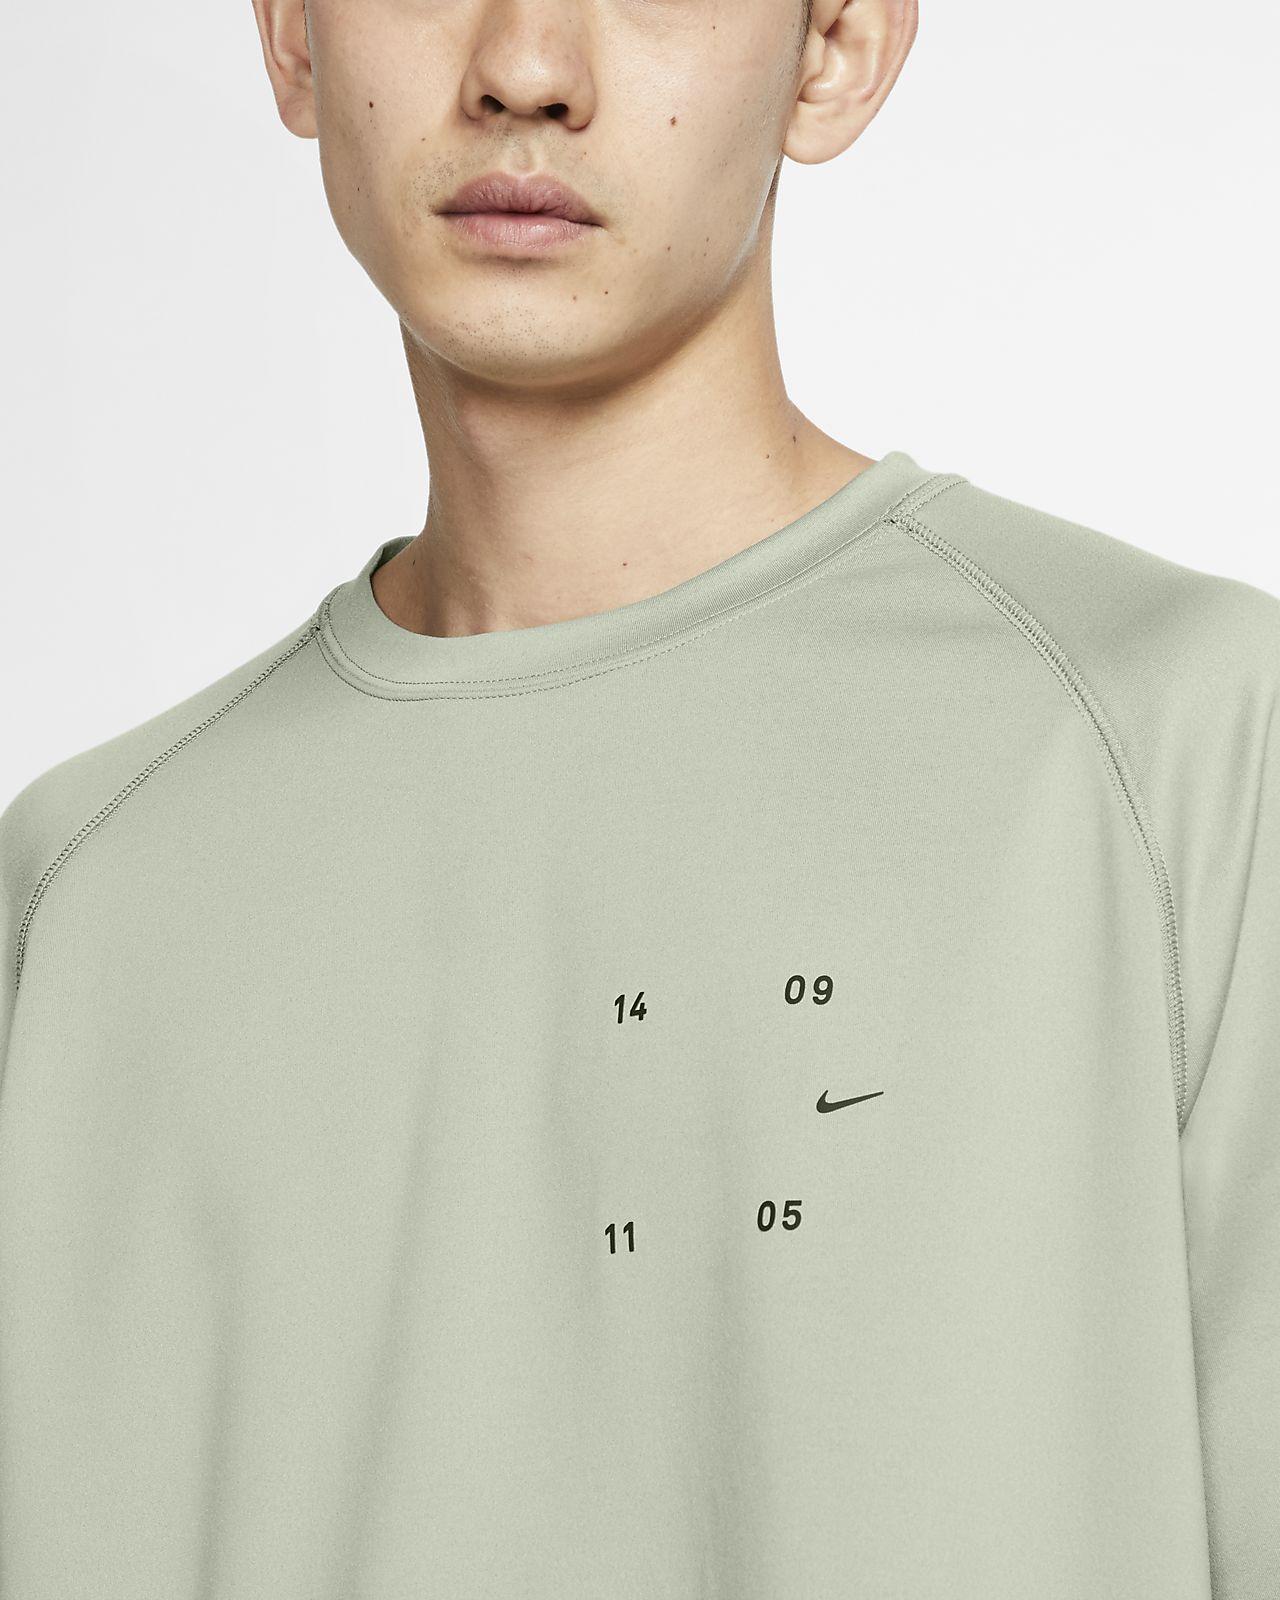 5c96ac6a886a Nike Sportswear Tech Pack Men's Short-Sleeve Top. Nike.com NL